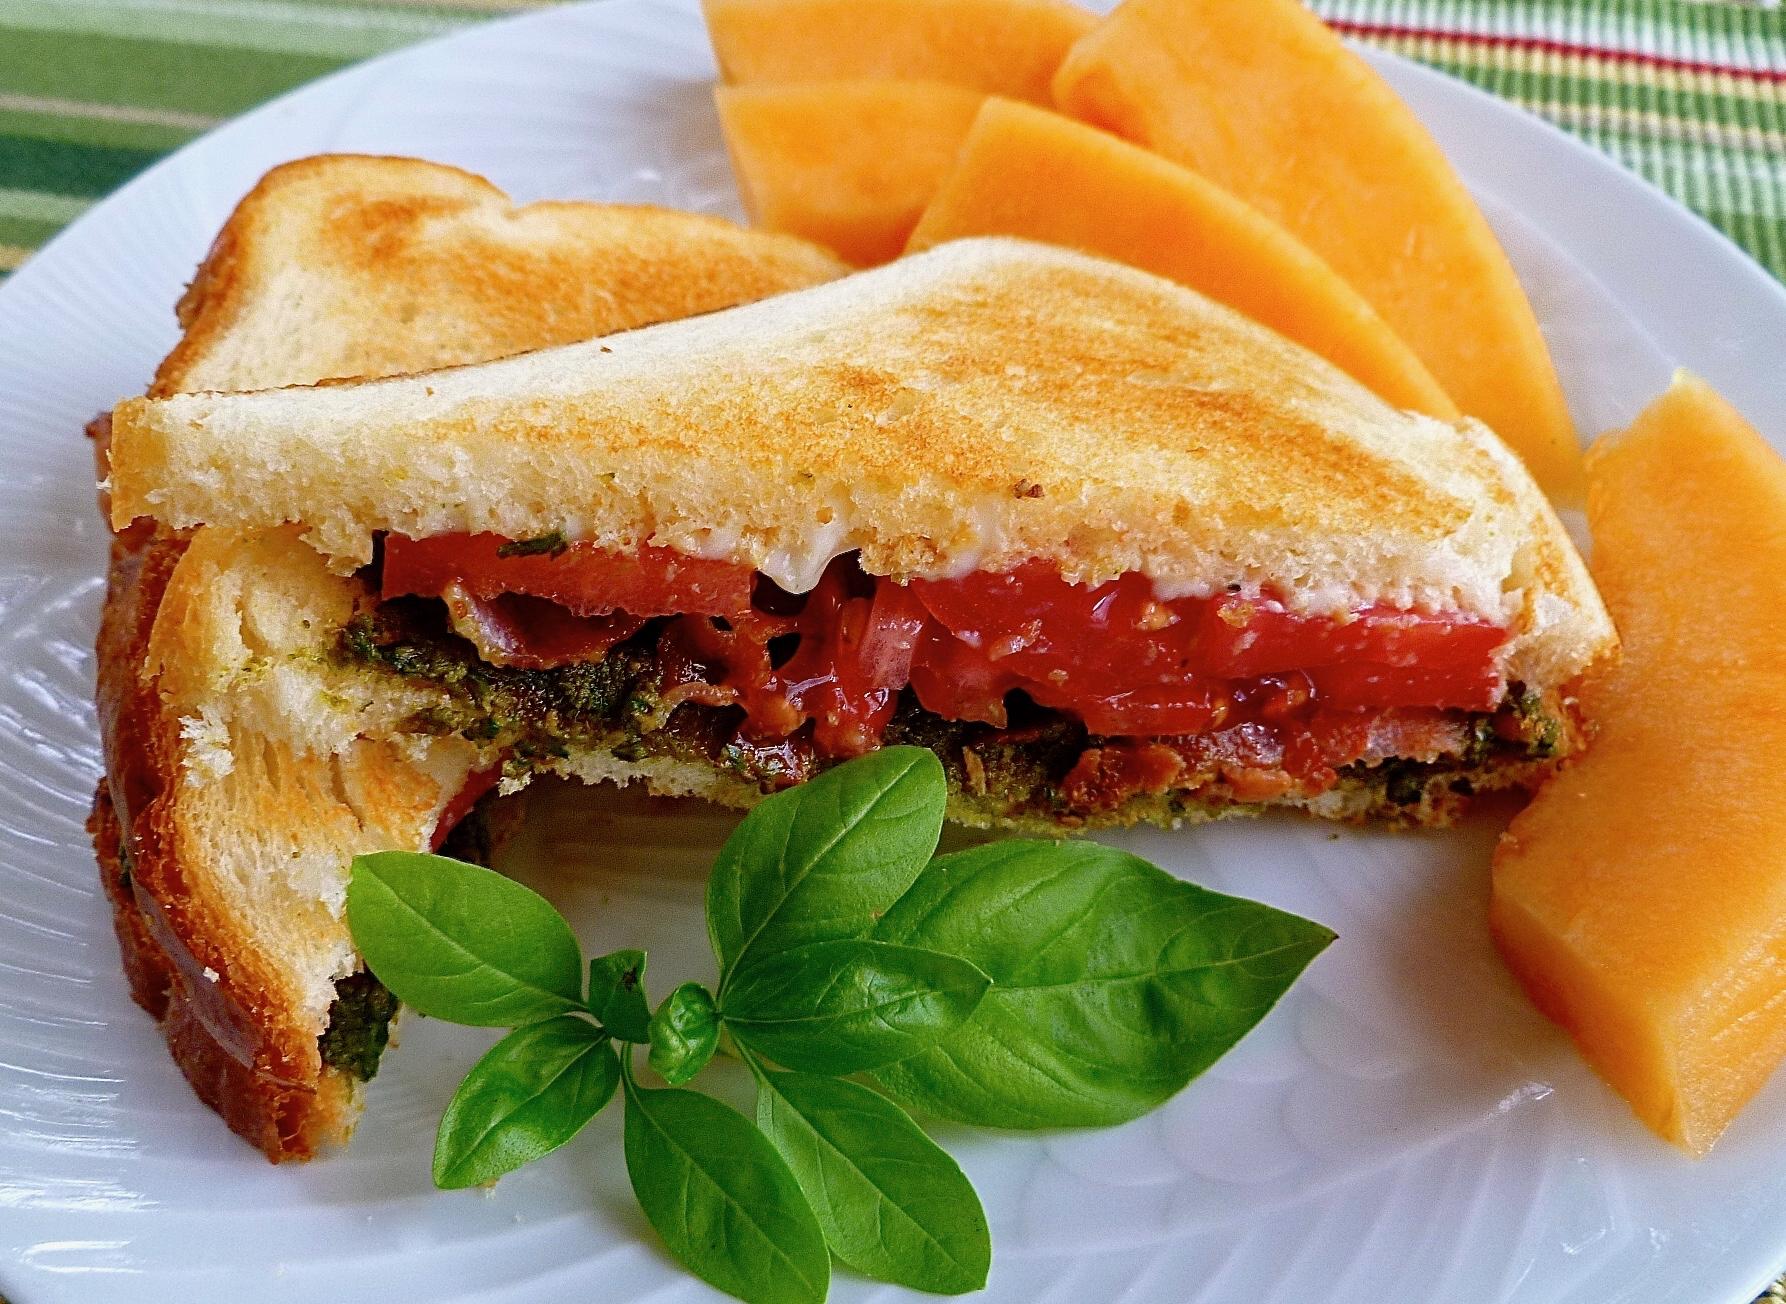 Bacon, Basil Pesto, and Tomato Sandwich